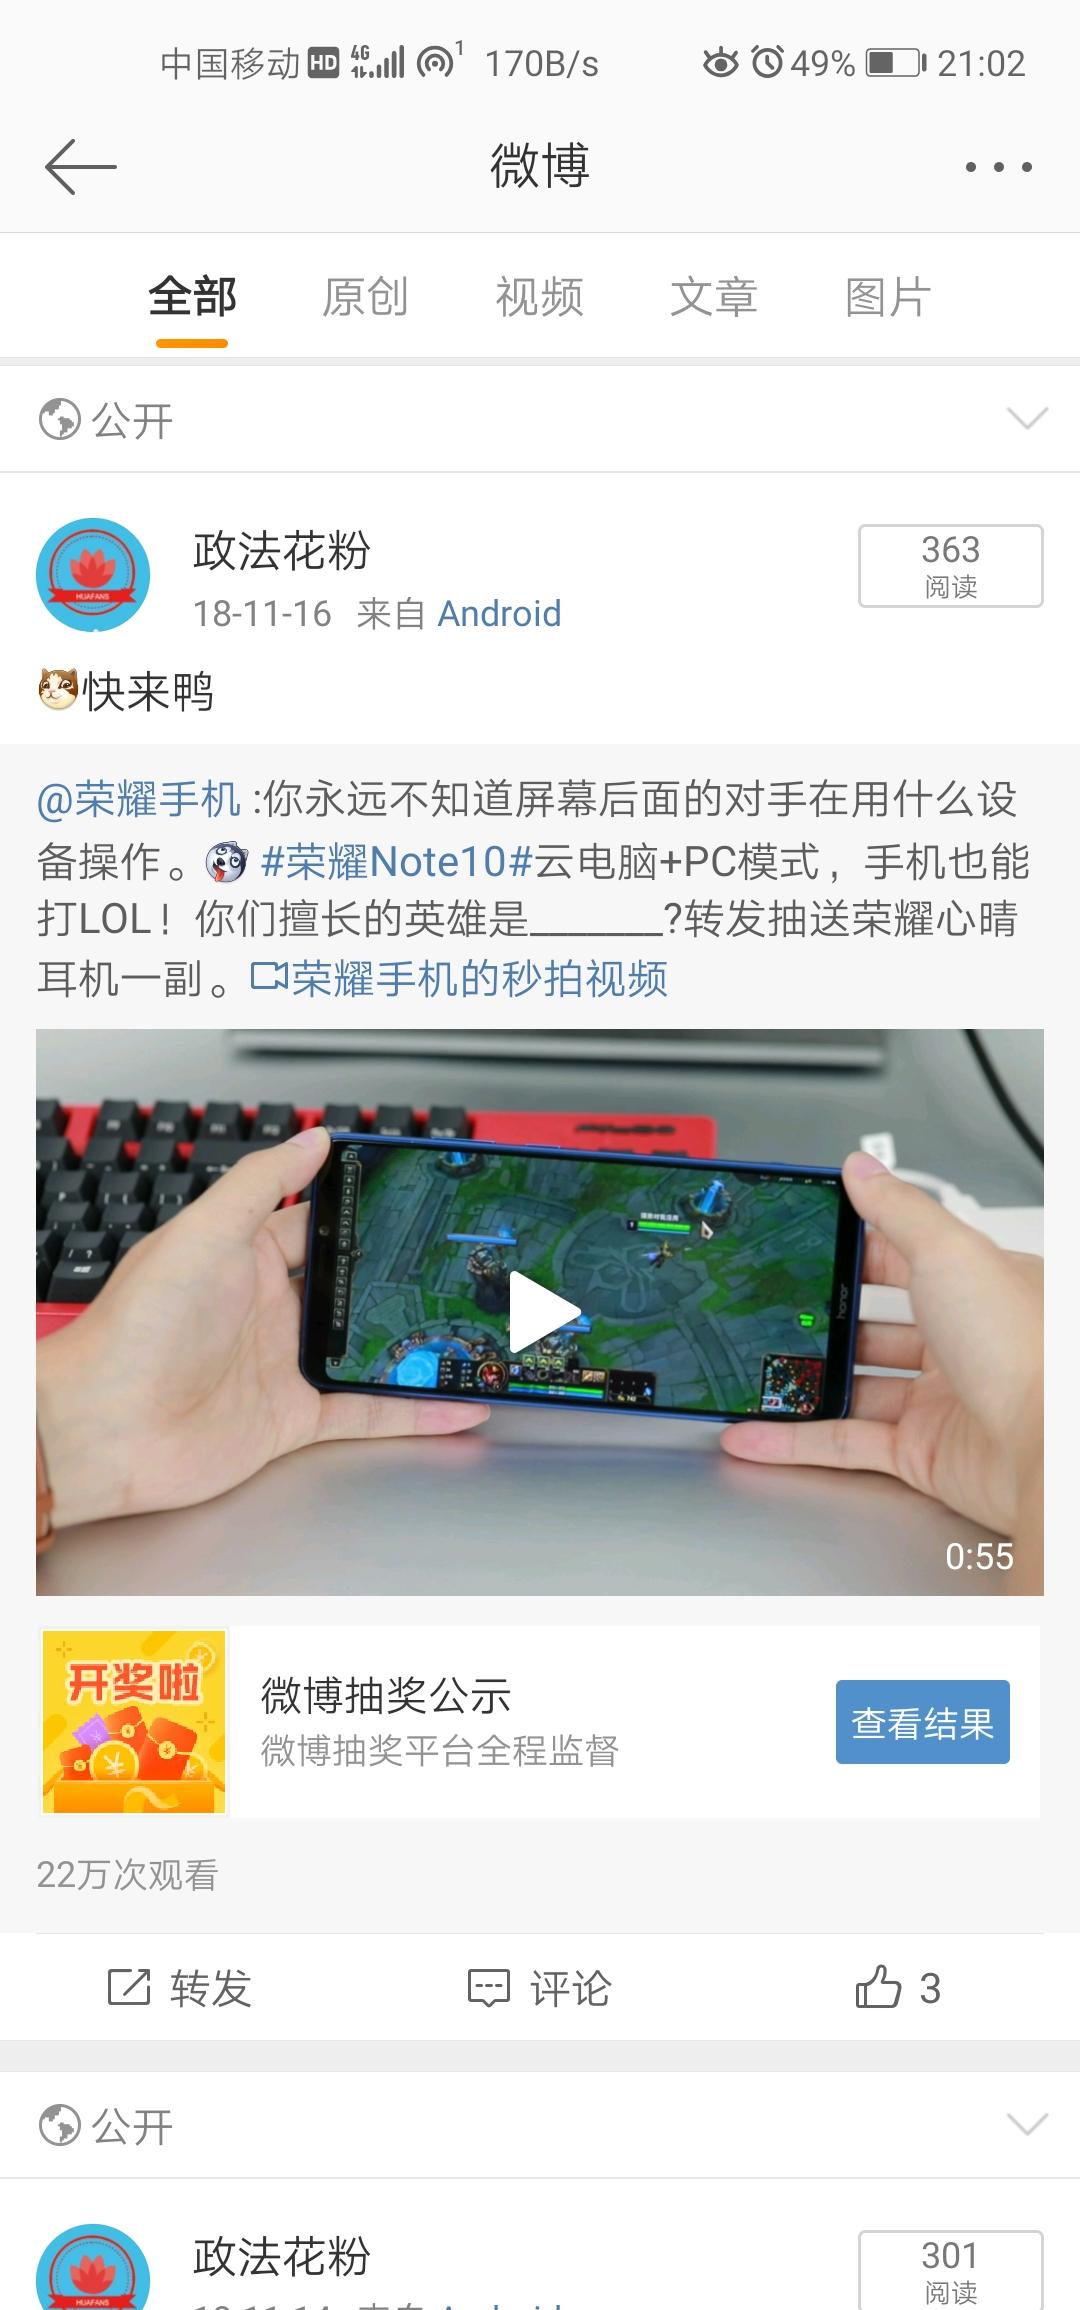 Screenshot_20190210_210231_com.sina.weibo.jpg